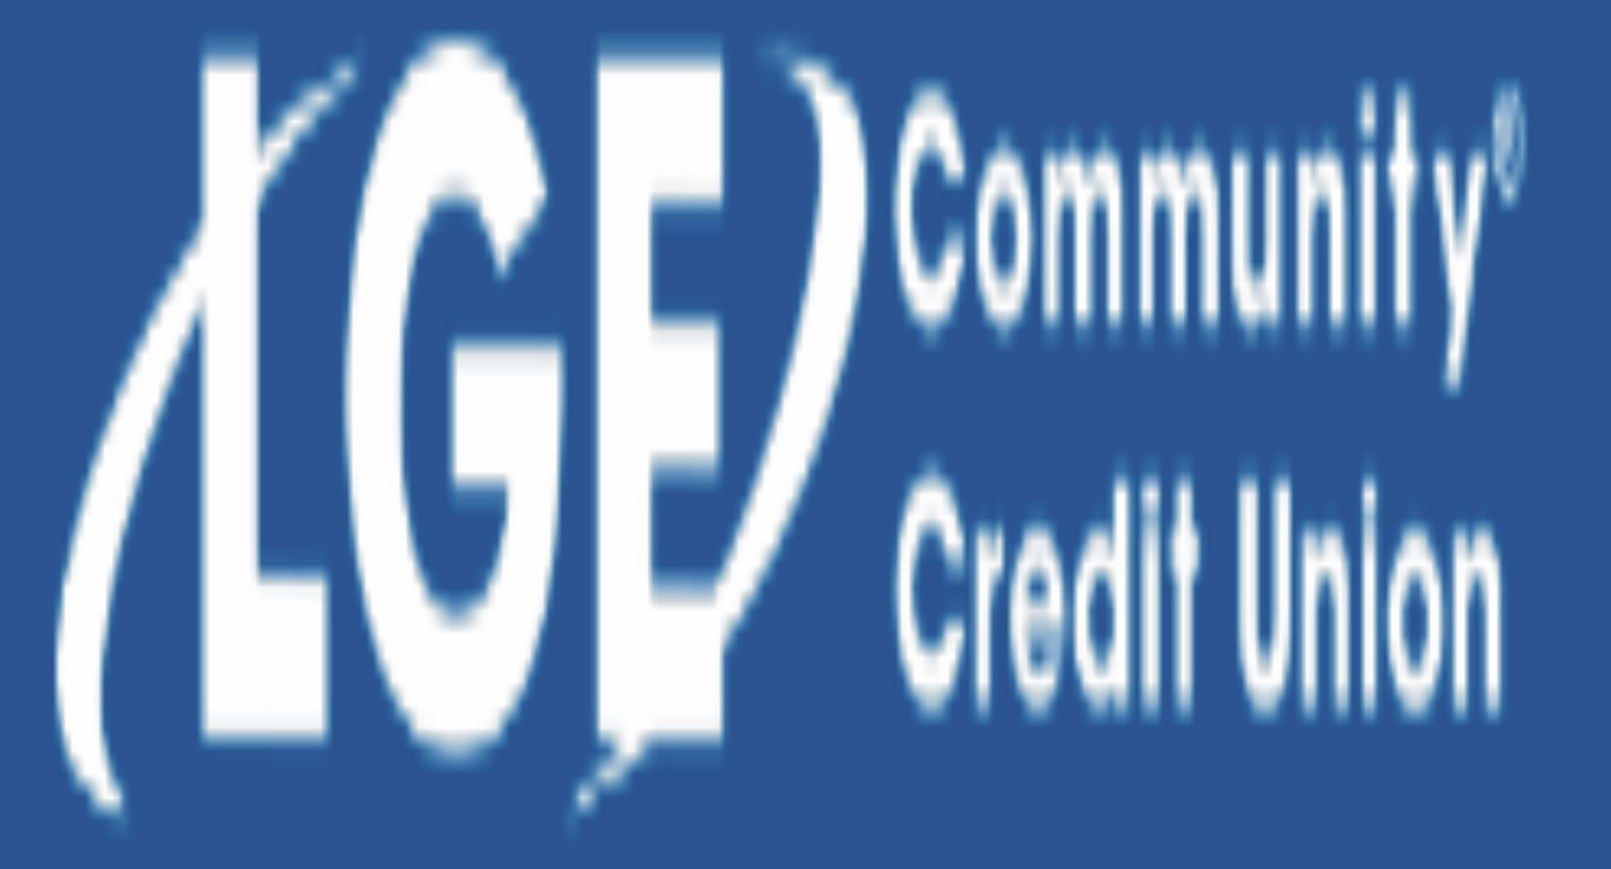 Lge community credit union visa platinum credit card